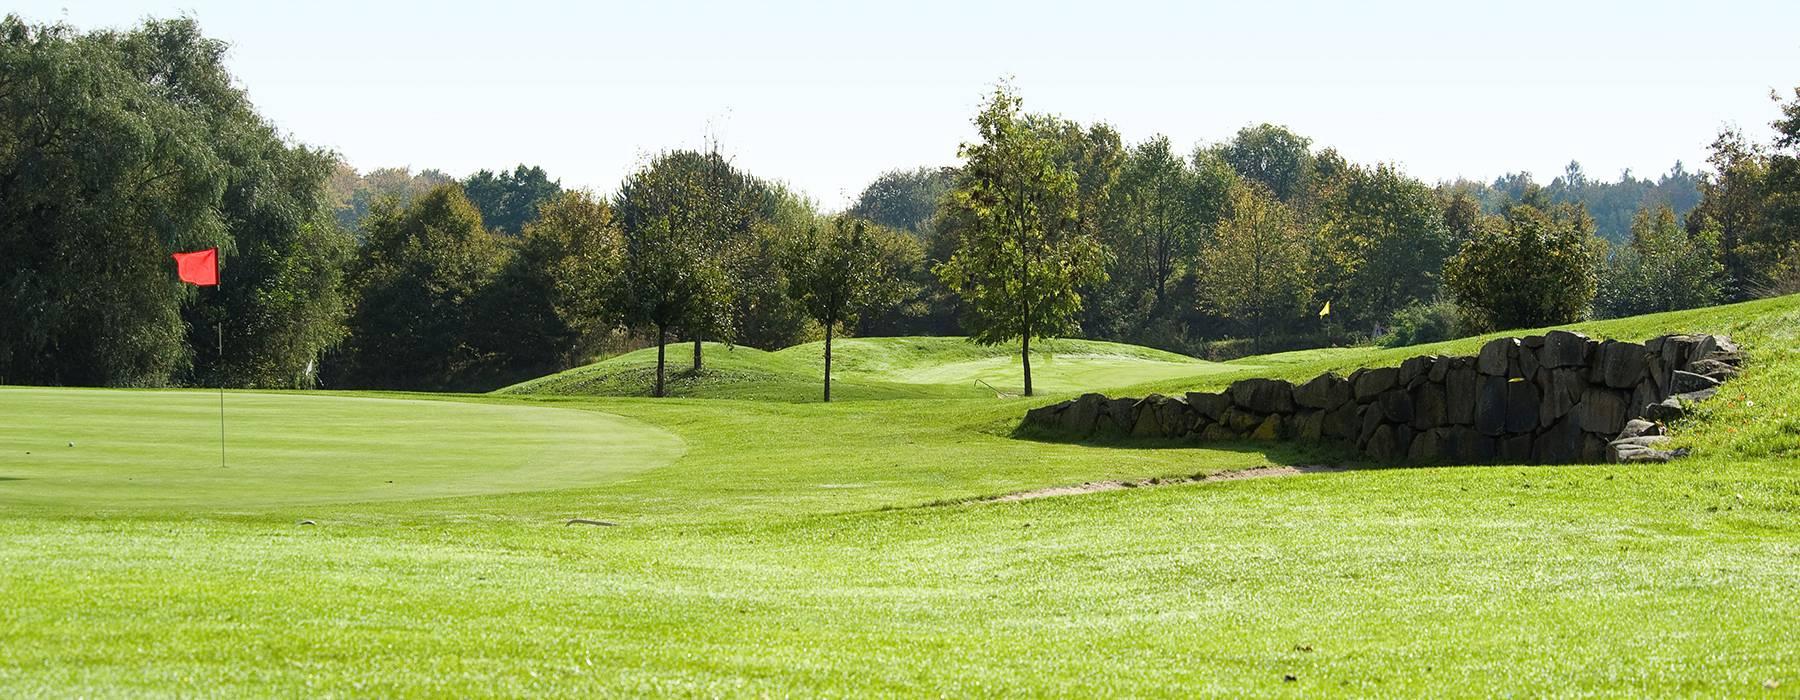 Overview of golf course named Homburg/Saar Websweiler Hof Golf Club